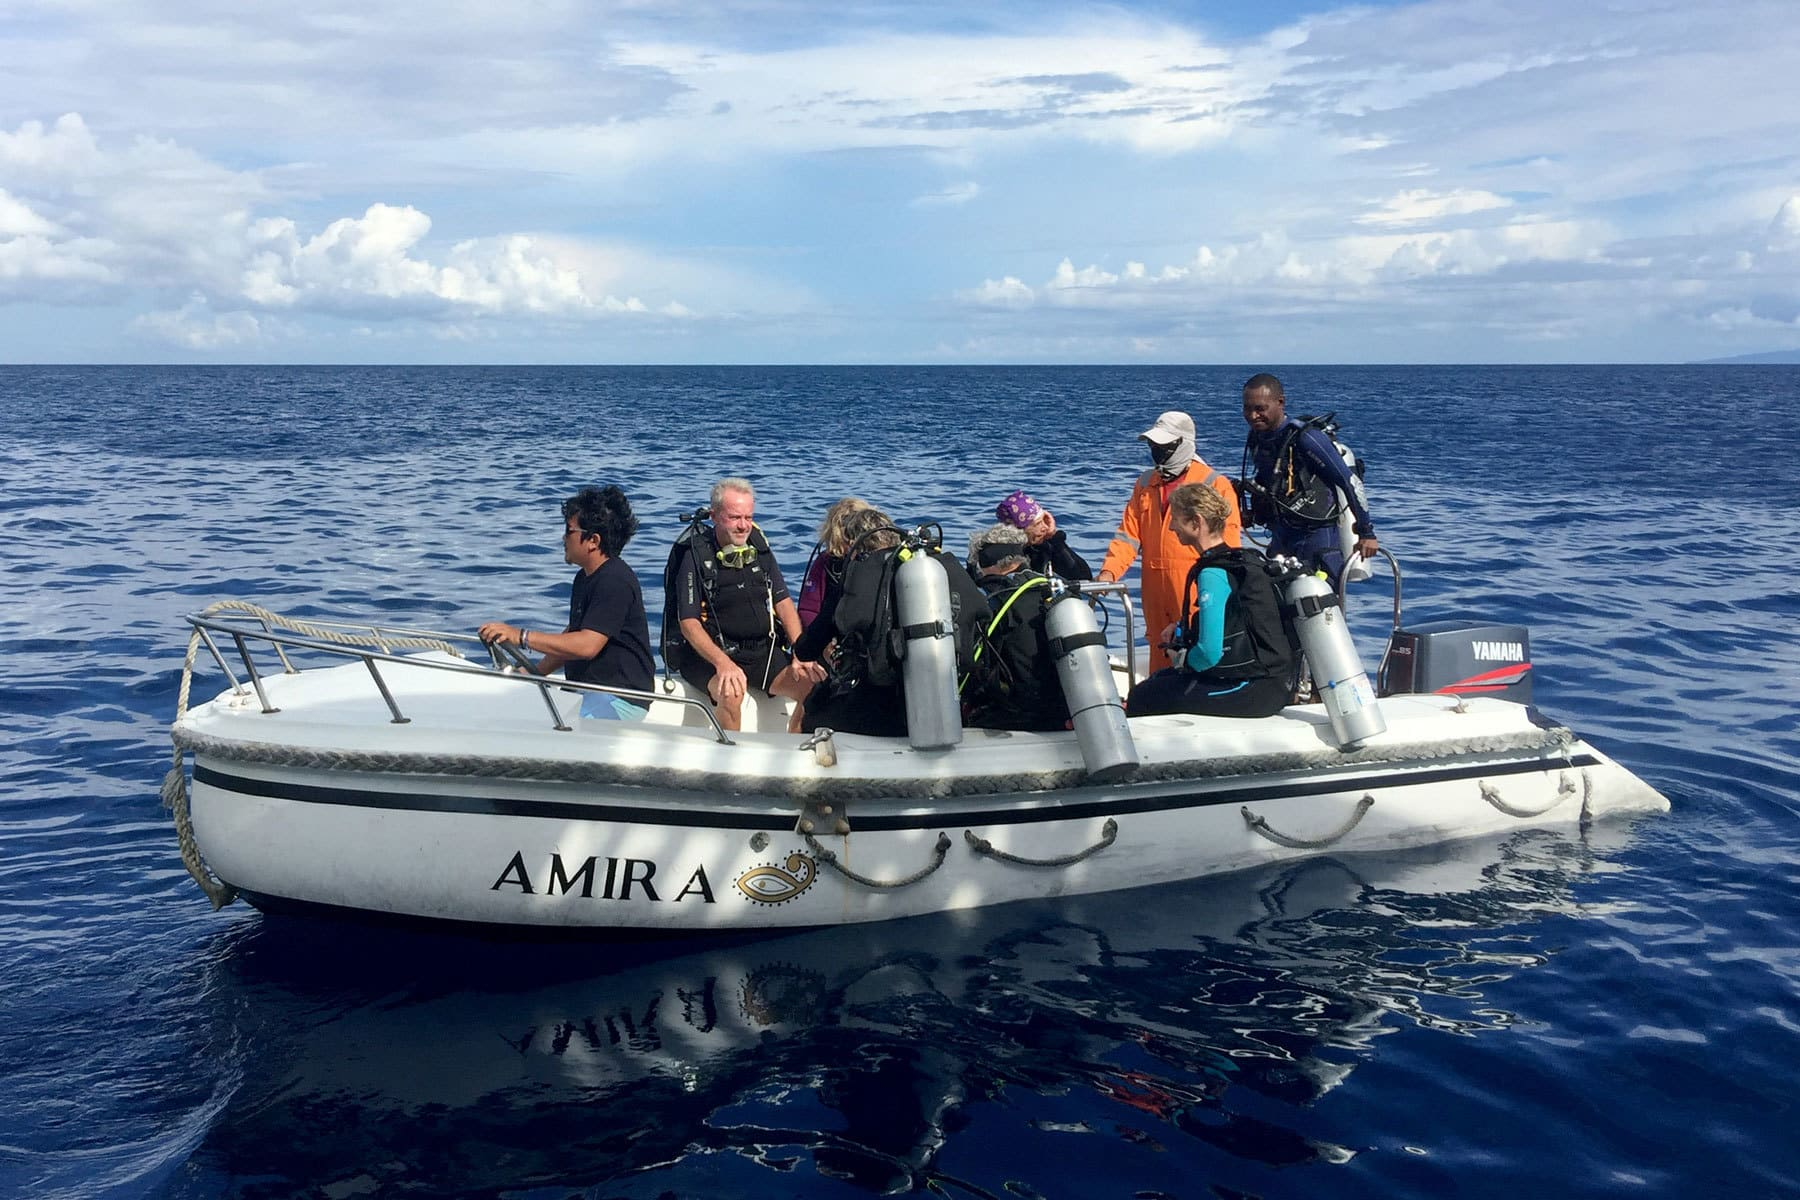 M.S.V. Amira - Tauchsafari in Raja Ampat, Cenderawasih Bay und Komodo